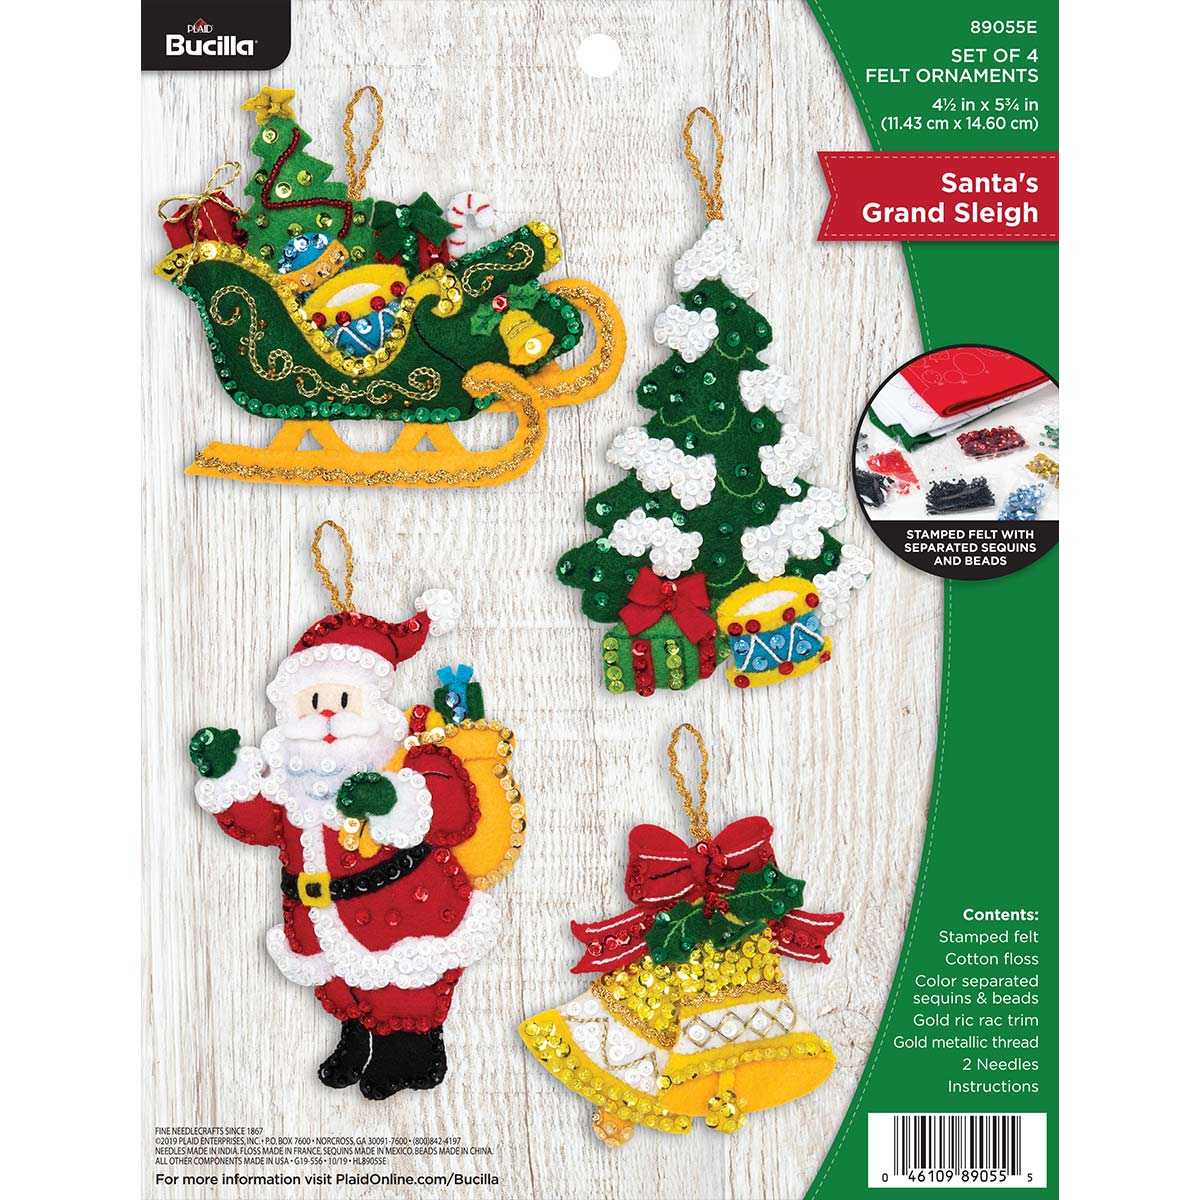 Bucilla 89055E Santa/'s Grand Sleigh Felt Applique Ornament Kit